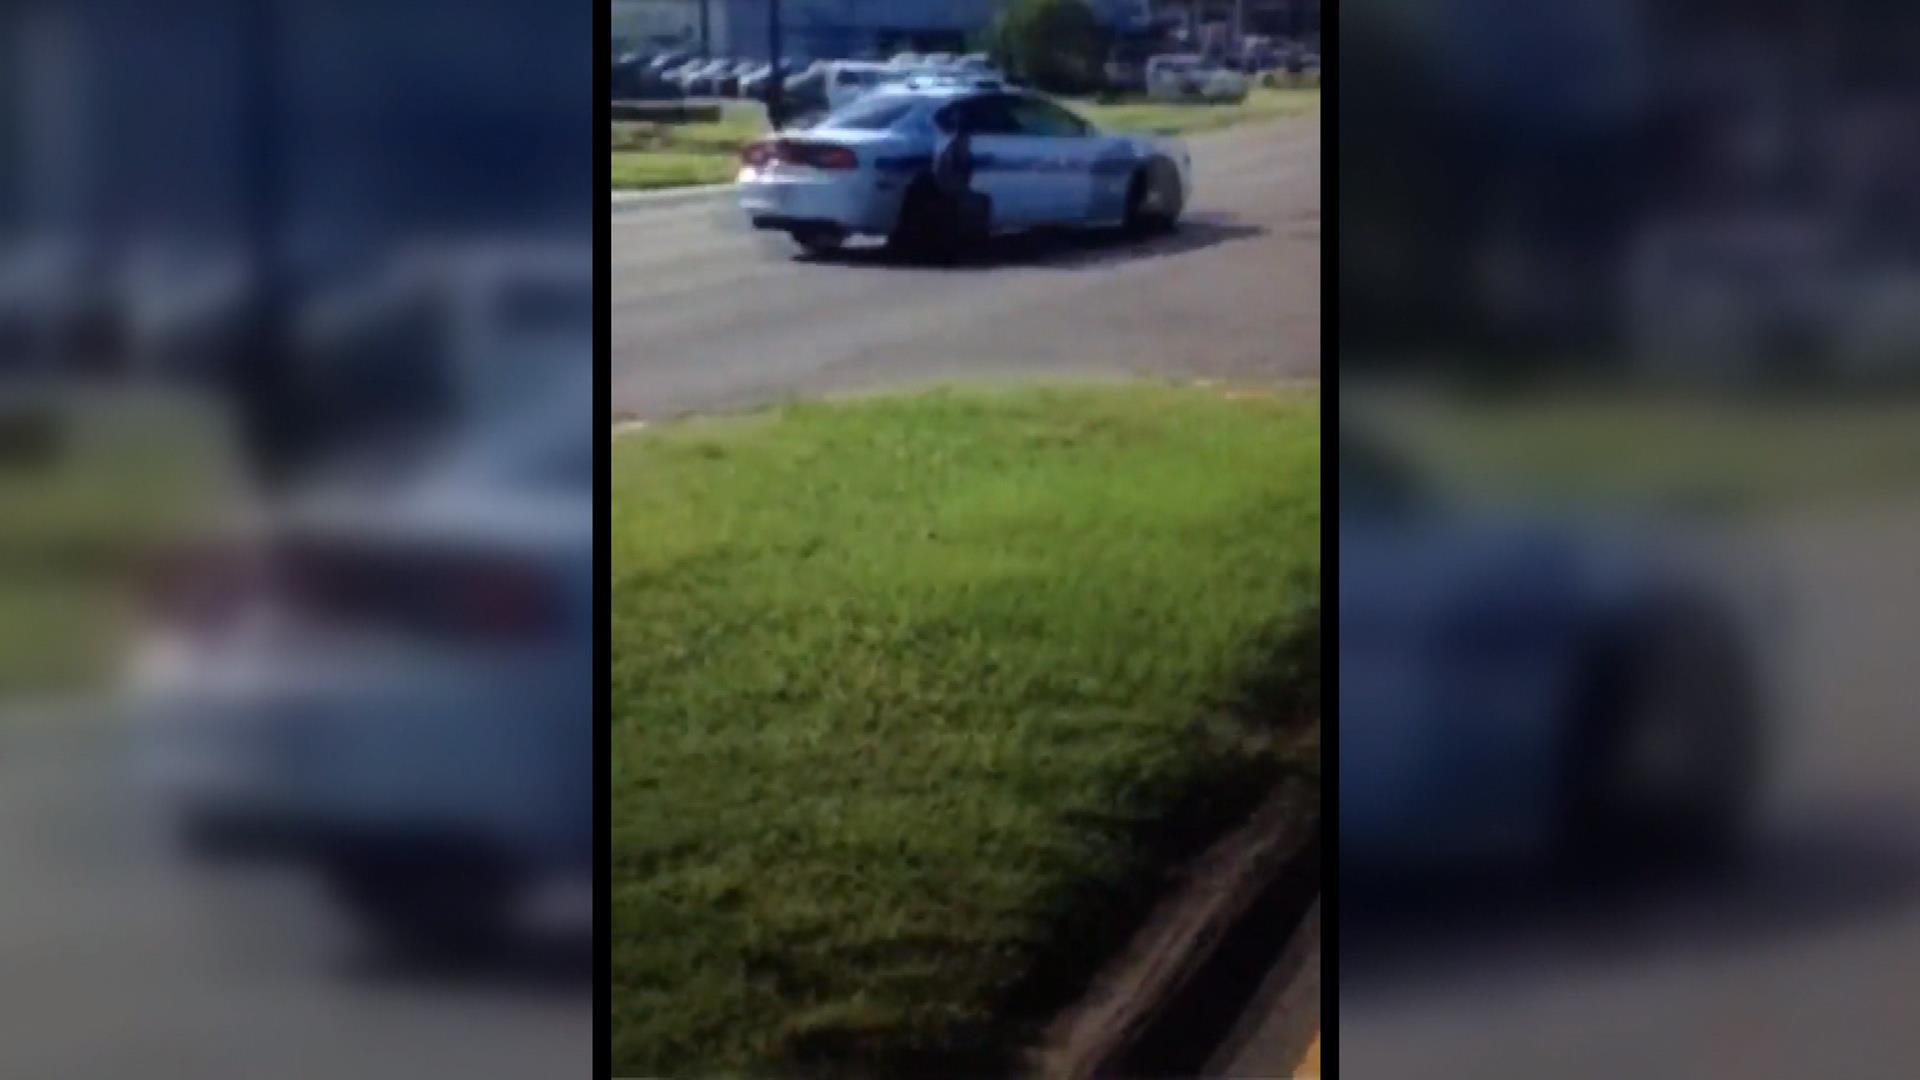 Baton Rouge Police Ambush: Cop Killer Didn't Make 911 Call